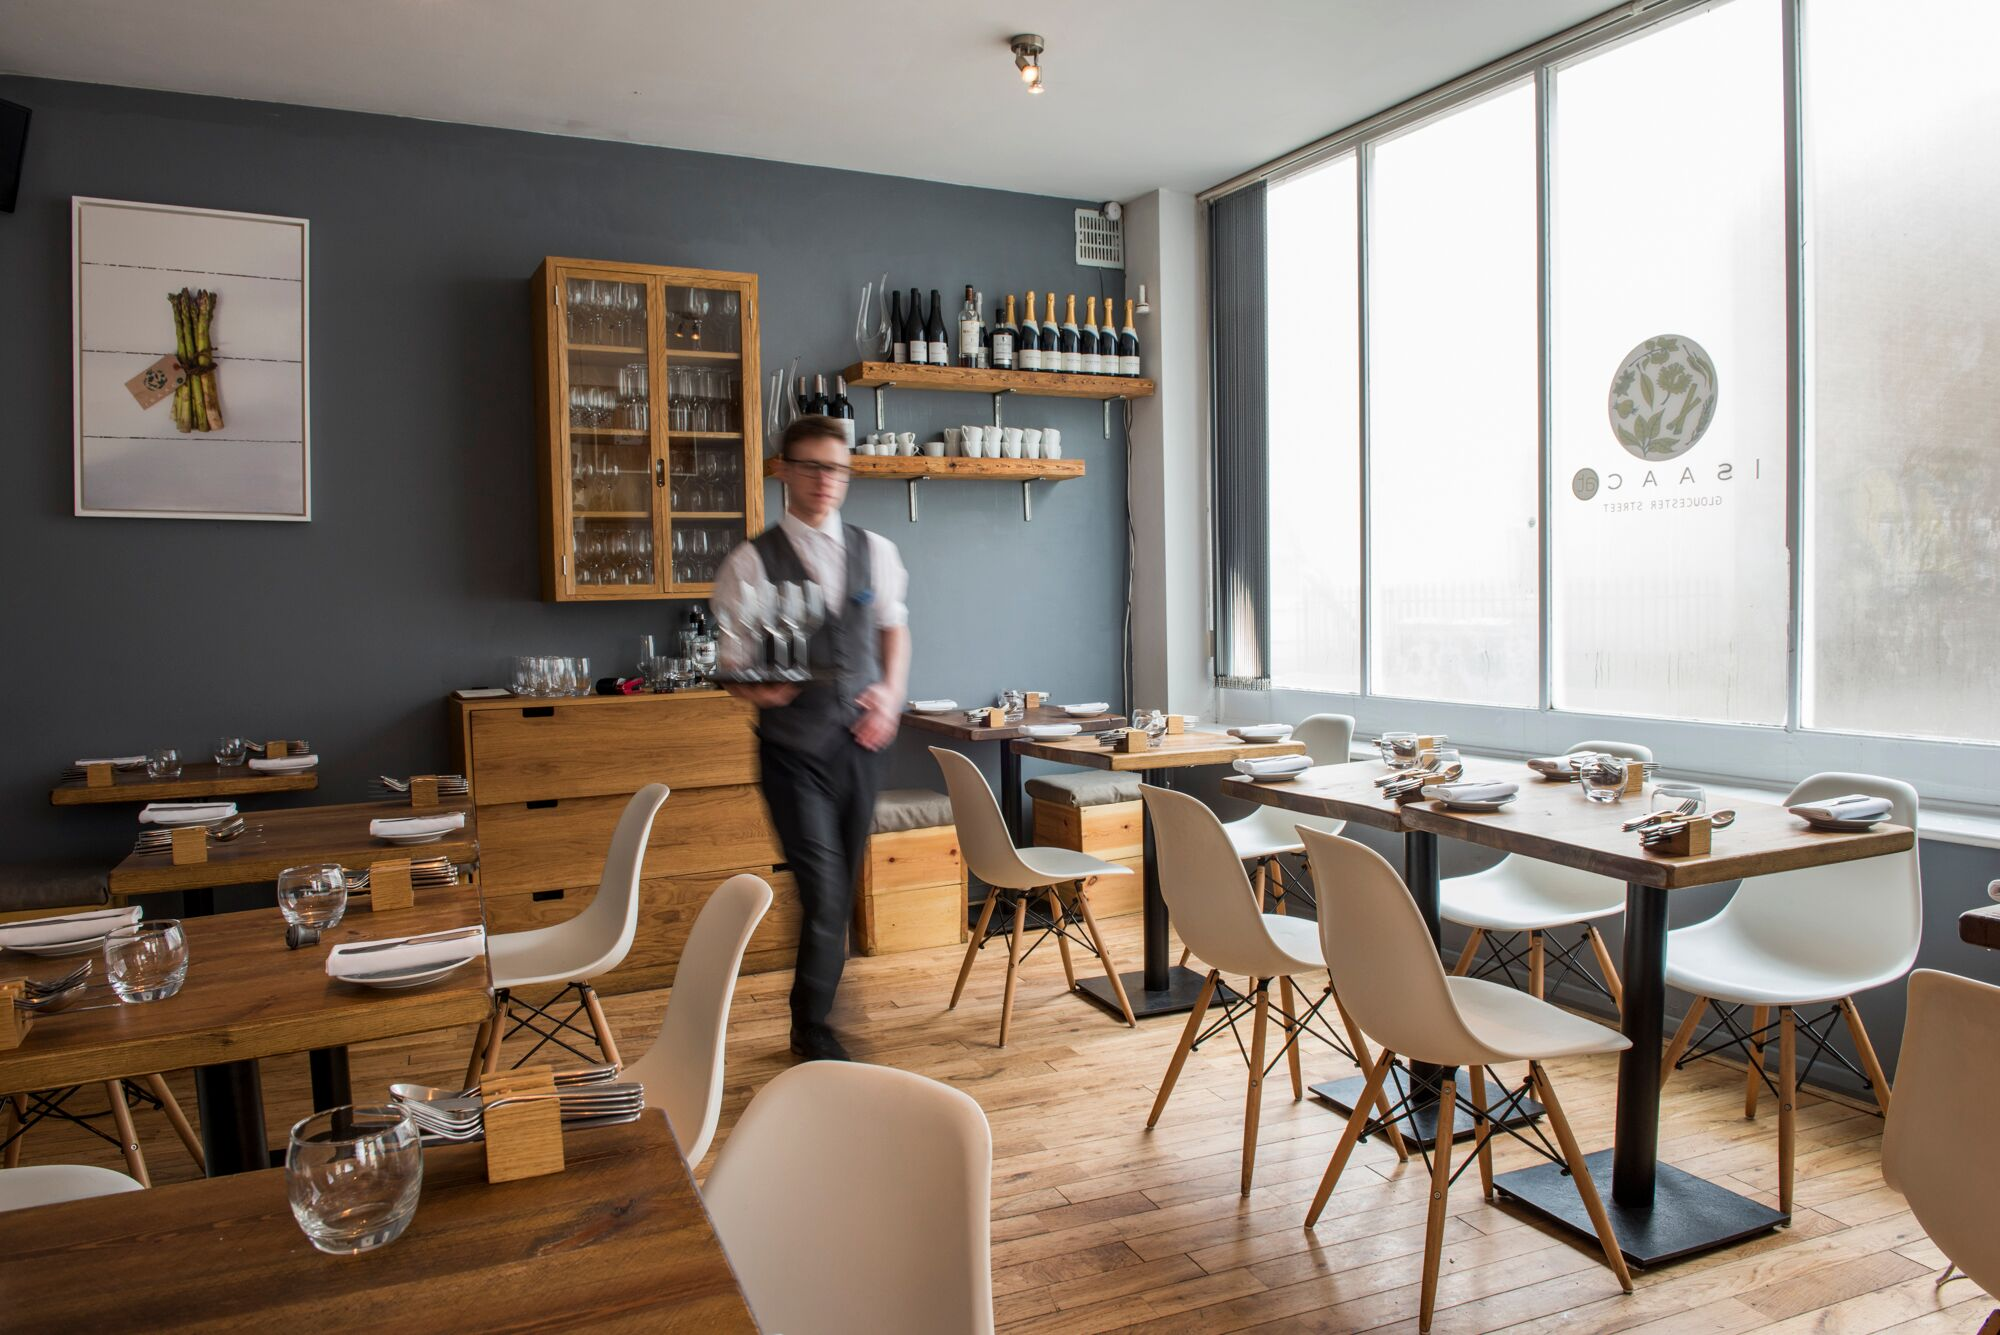 The Interior at Isaac Restaurants Brighton